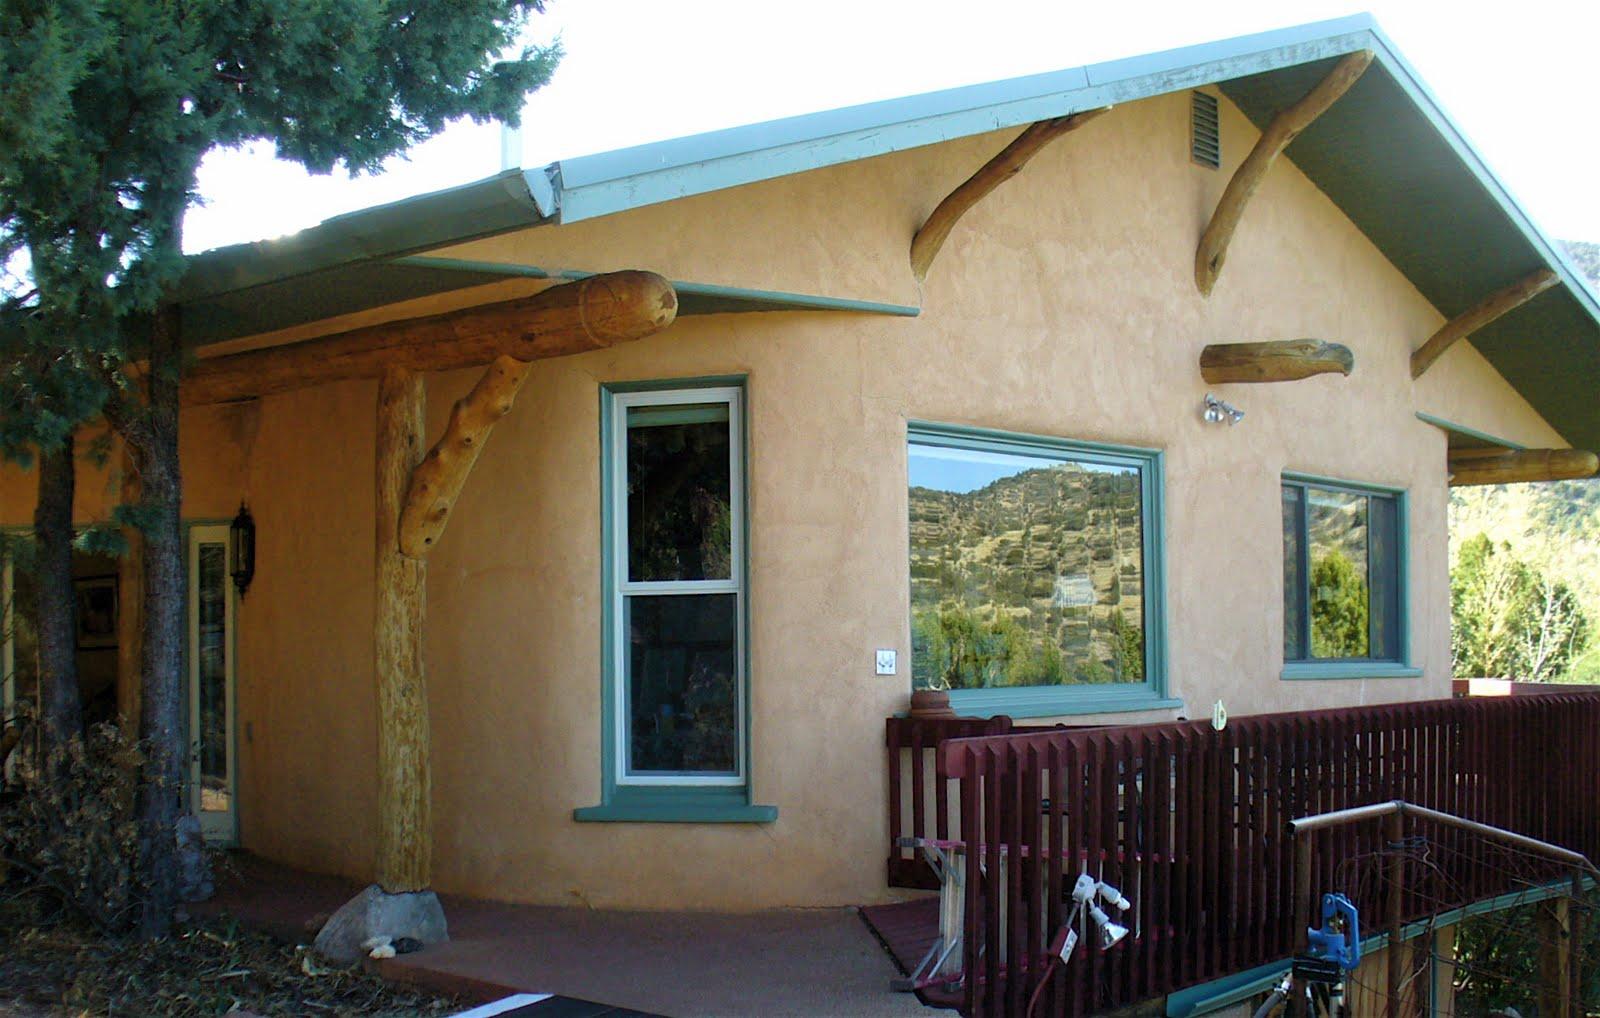 Alt build blog a straw bale home - Straw bale house ...